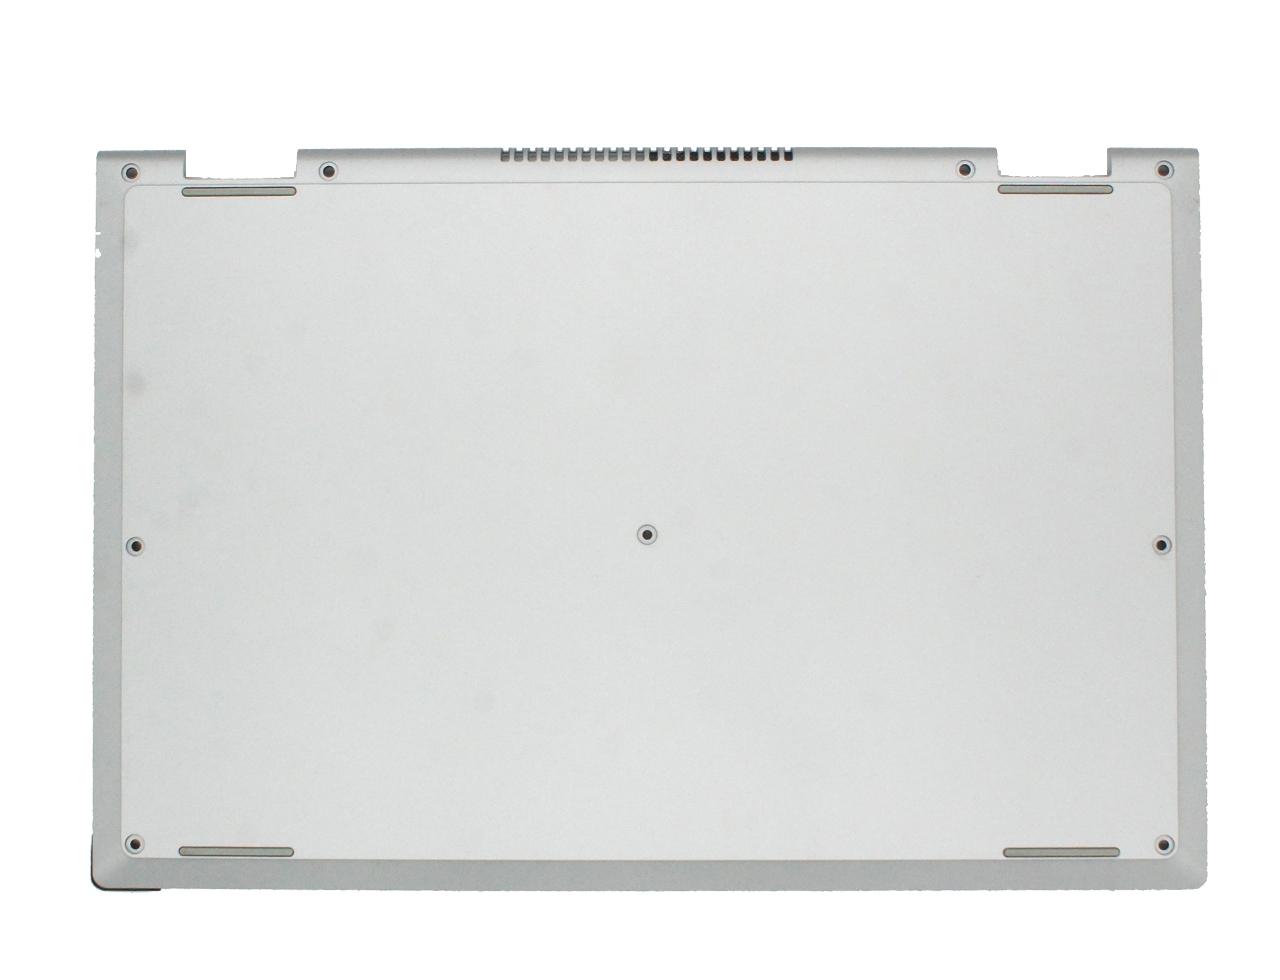 新到货 496片 戴尔Dell Inspiron 11 3000 3147 3148 P20T 底壳 D壳 D1WVJ 0D1WVJ